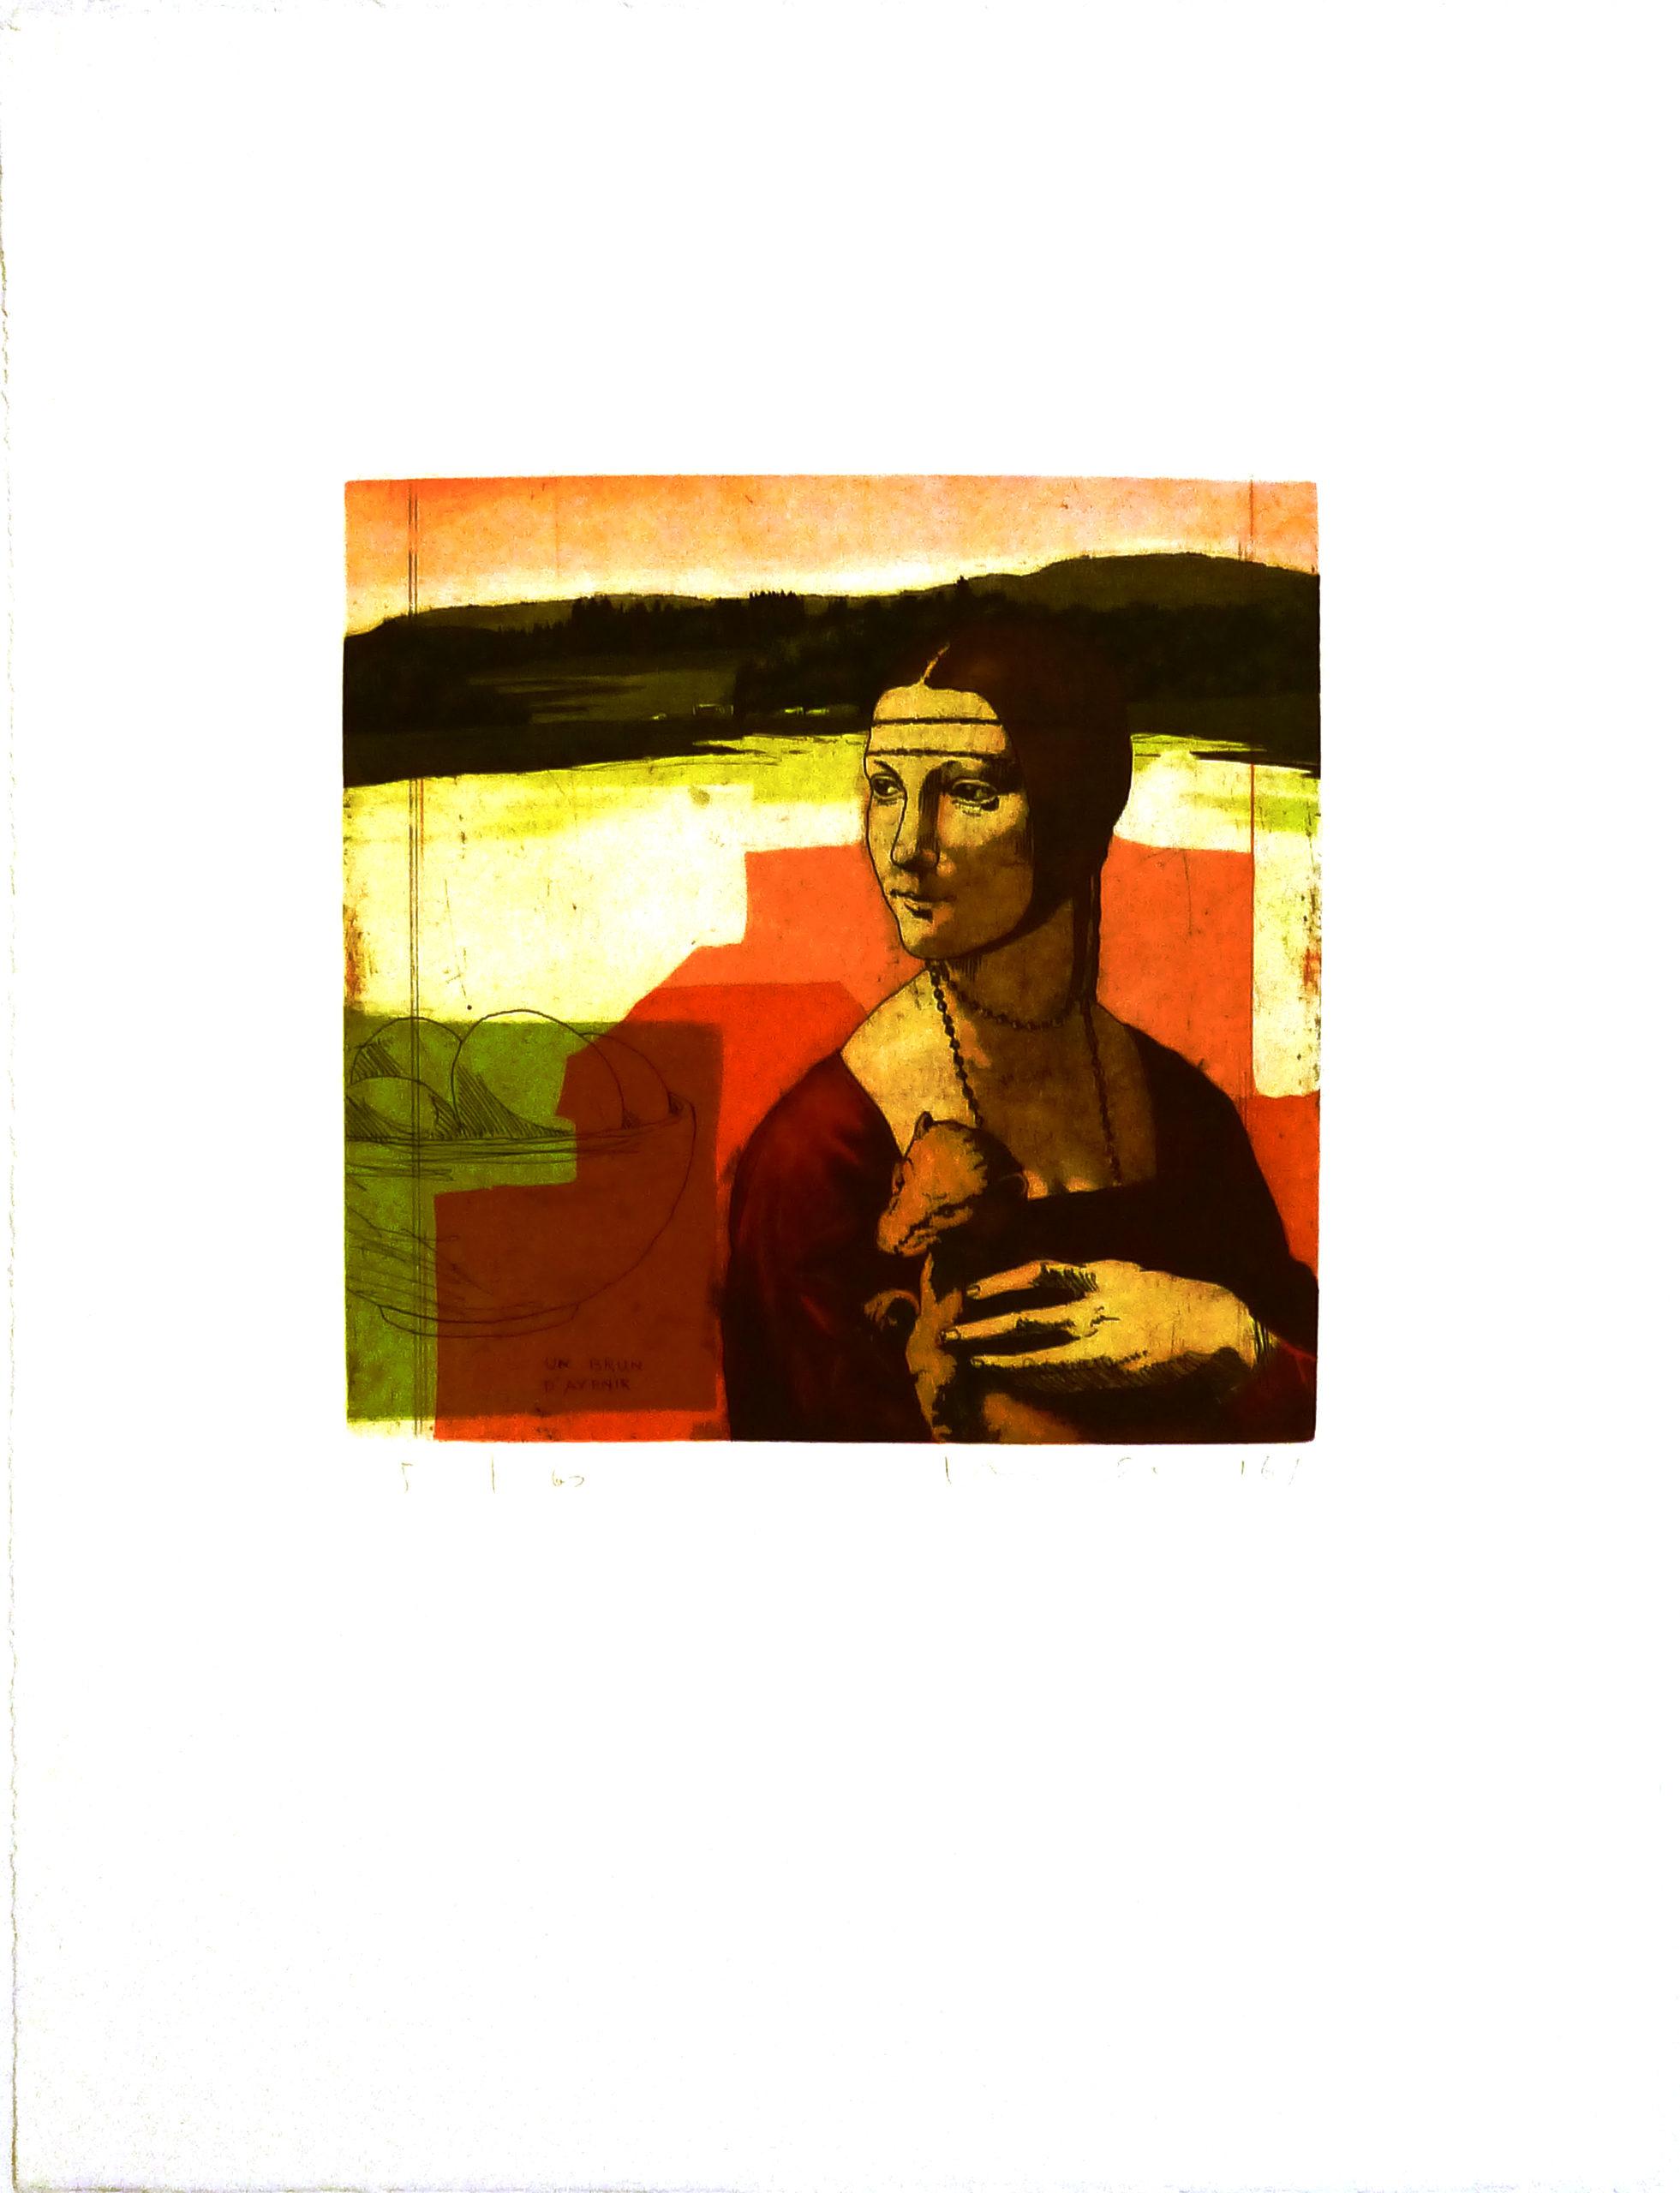 gravure-brin-avenir-kurt-mair